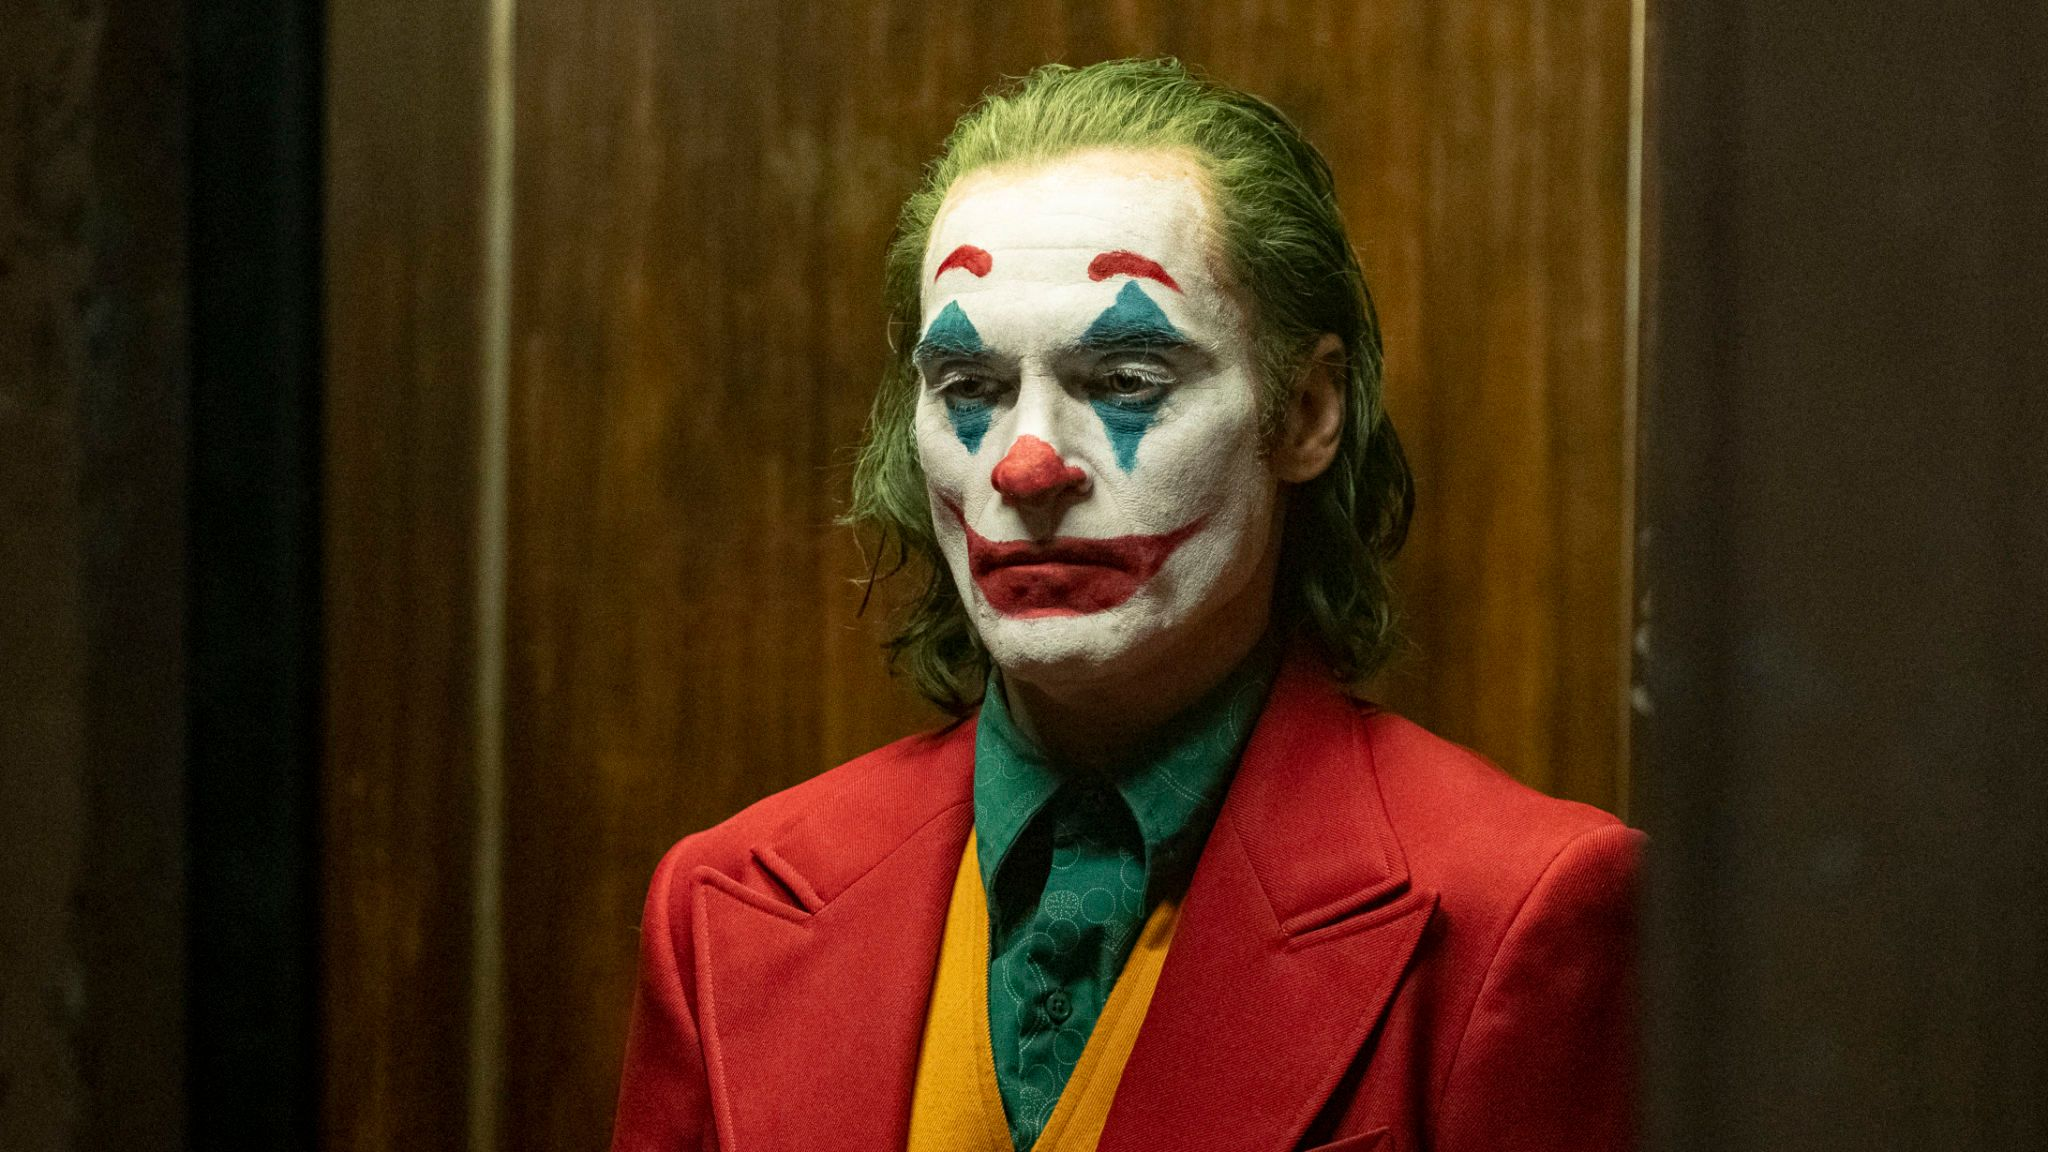 JOAQUIN PHOENIX as Joker. Pic: Warner Bros/Entertainment Inc